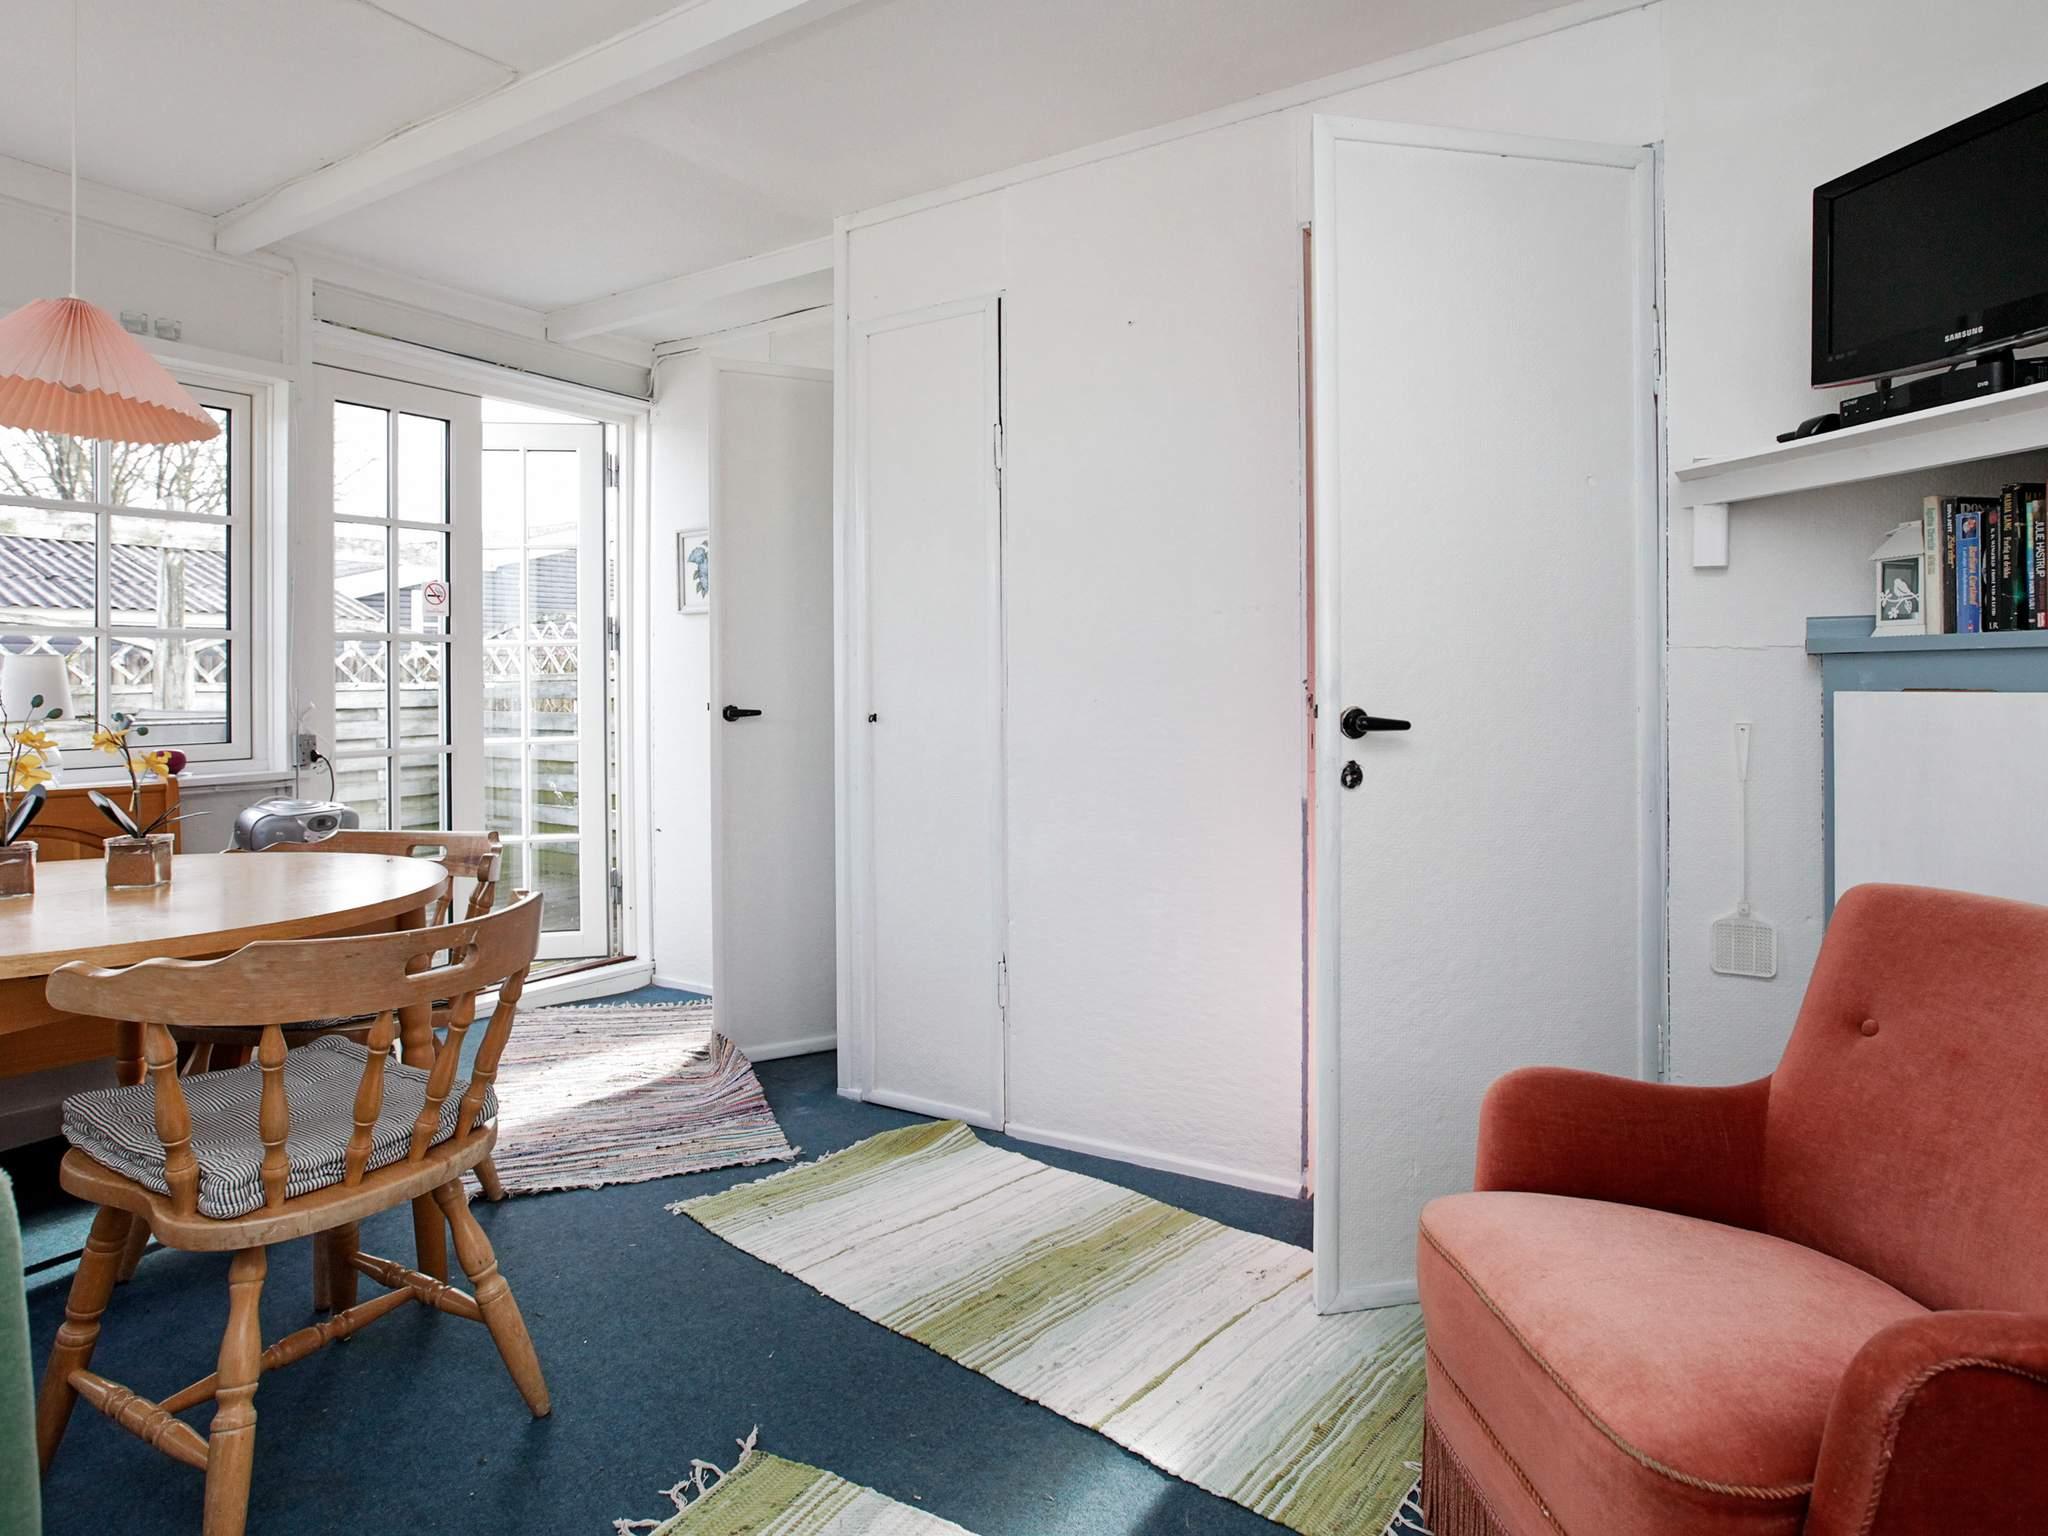 Maison de vacances Hasmark (1723417), Hasmark, , Fionie, Danemark, image 4